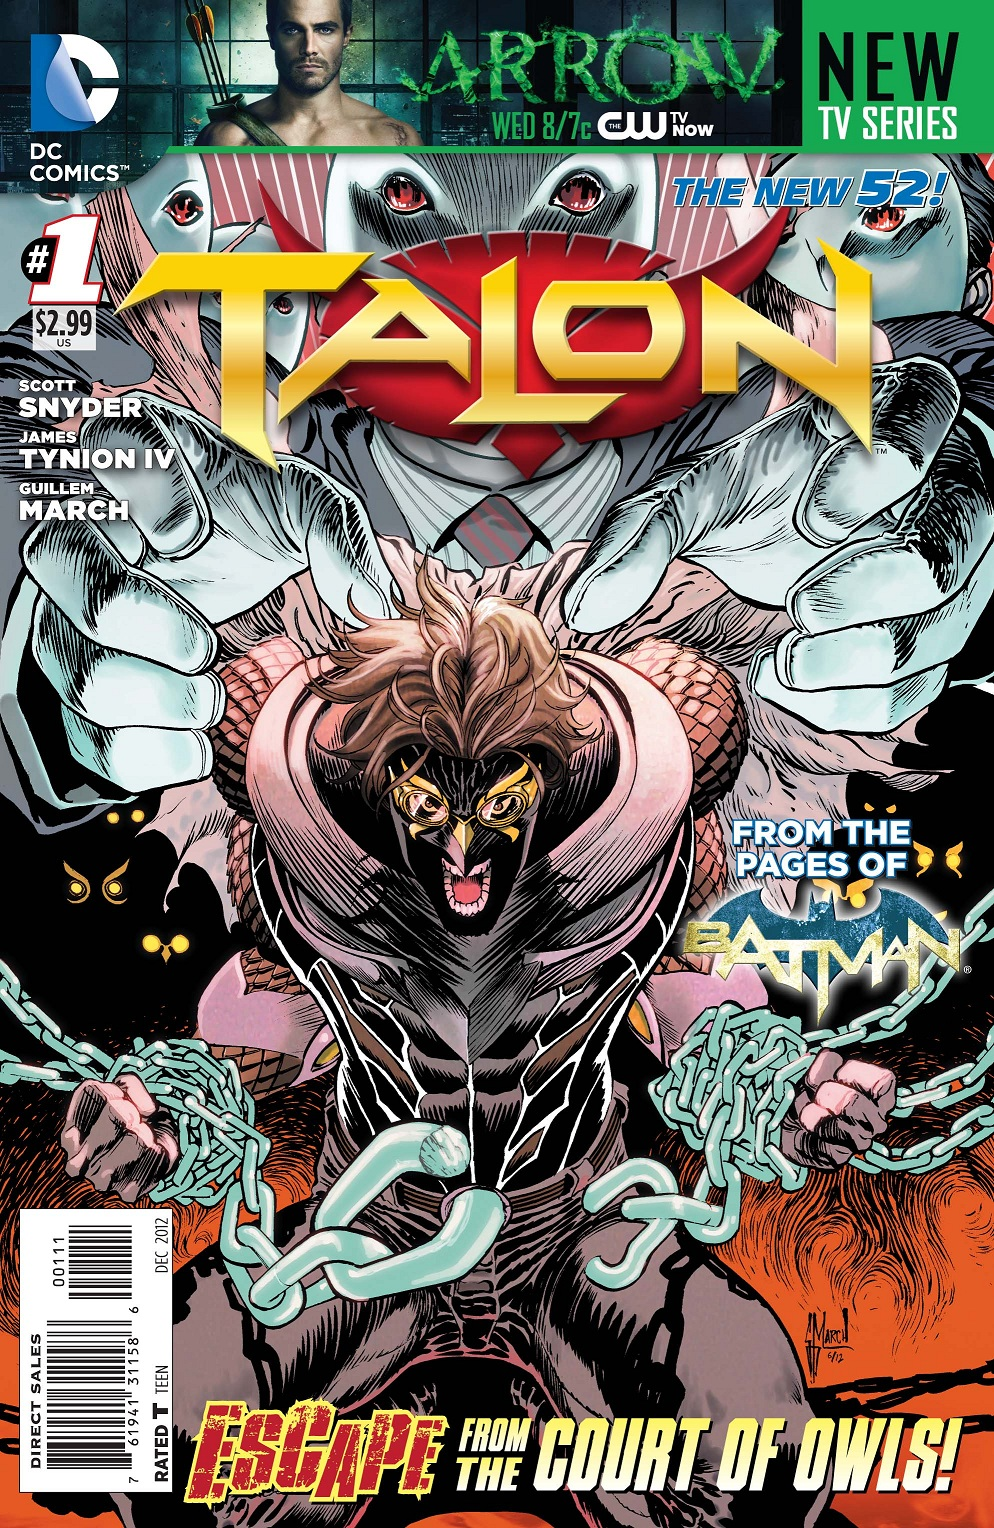 Talon number 1